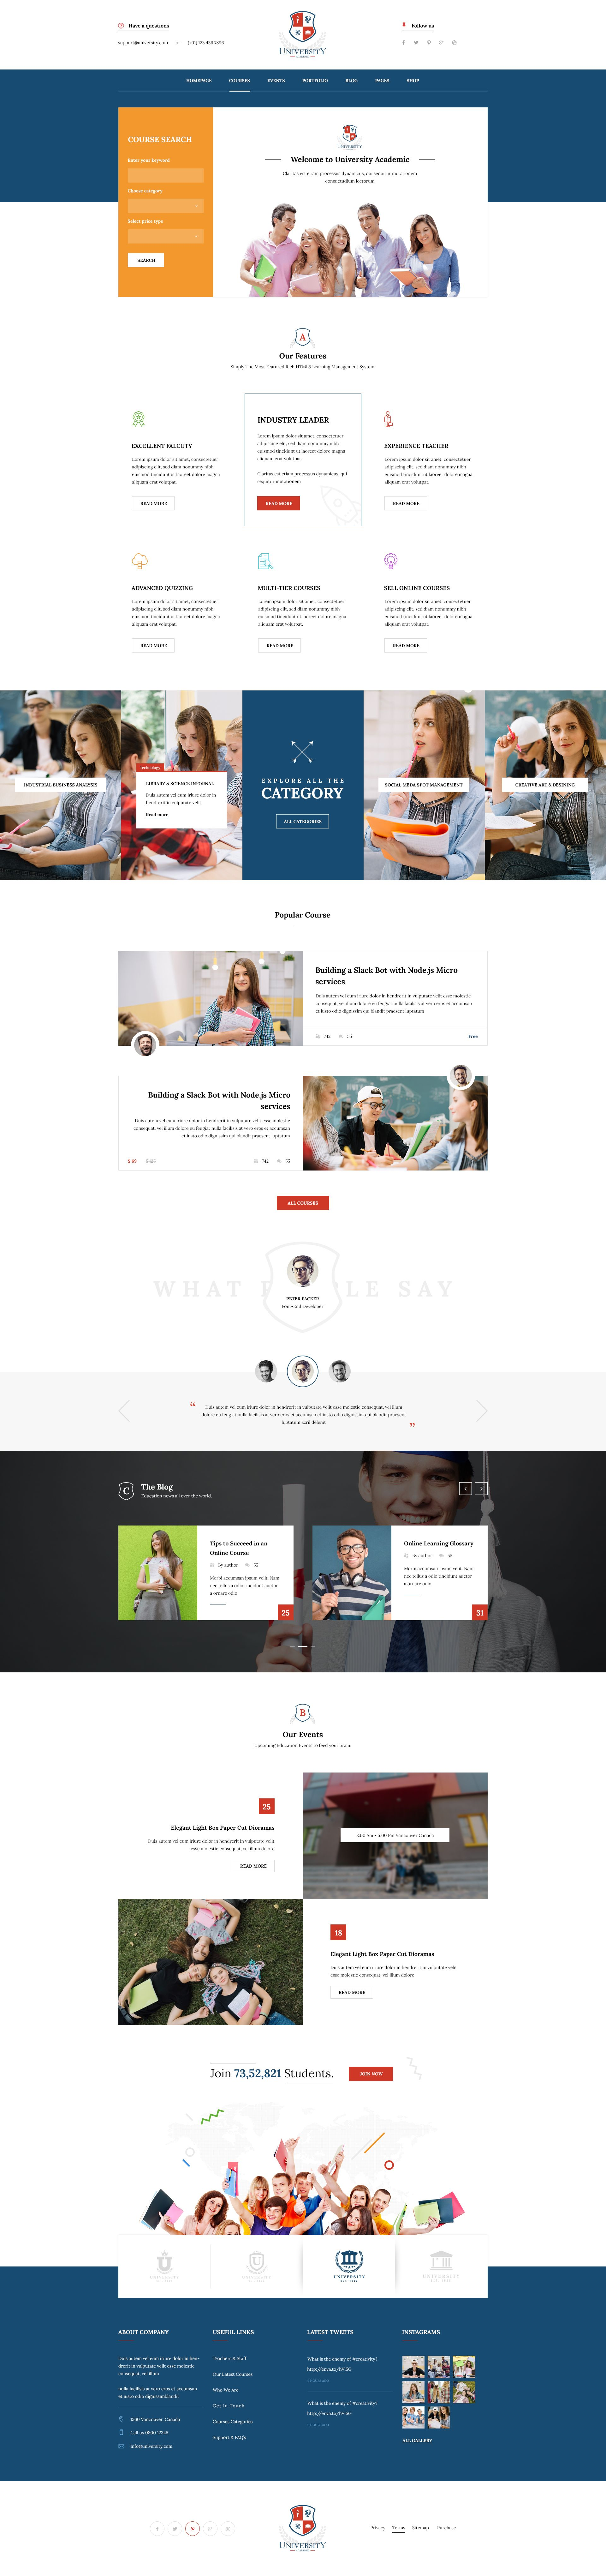 University Education Course Academy Psd Templates Web Layout Design Flat Web Design Grants For College